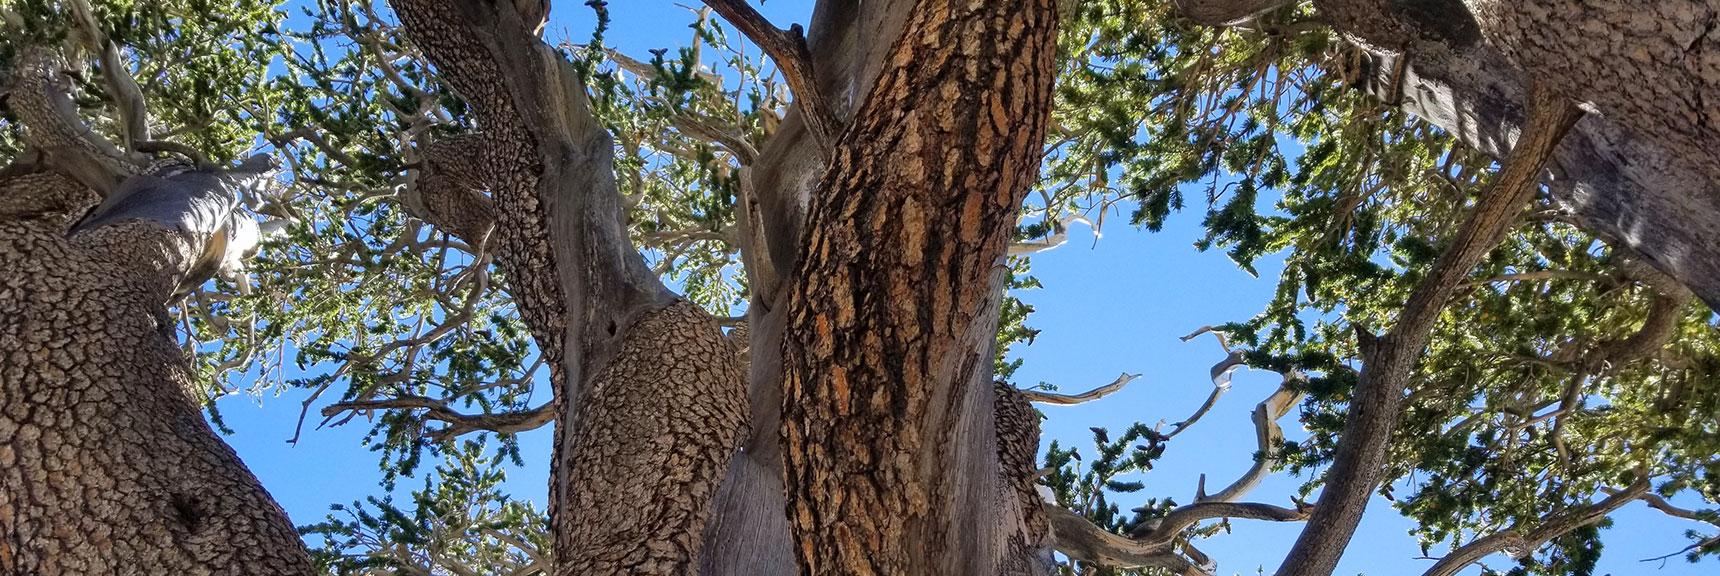 Raintree | Mt Charleston Wilderness | Spring Mountains, Nevada